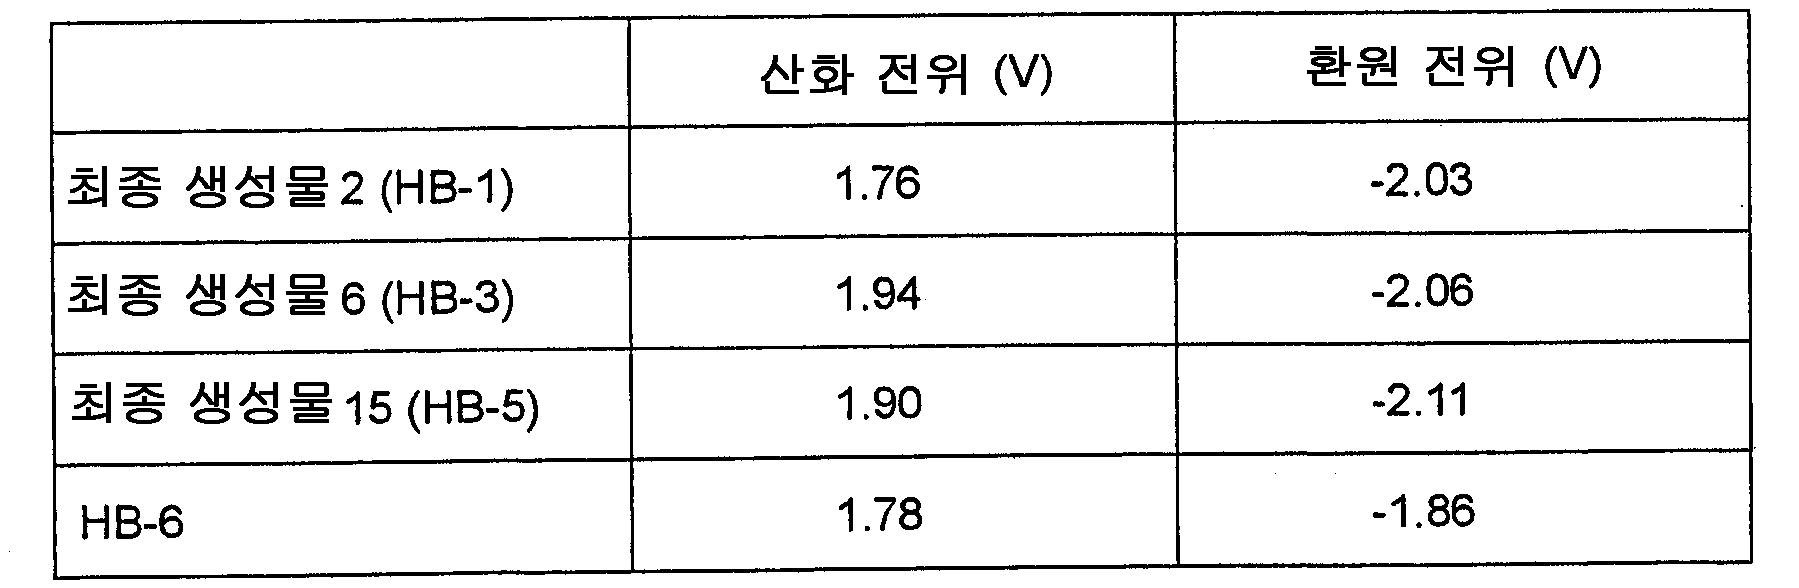 Figure 112010002231902-pat00151